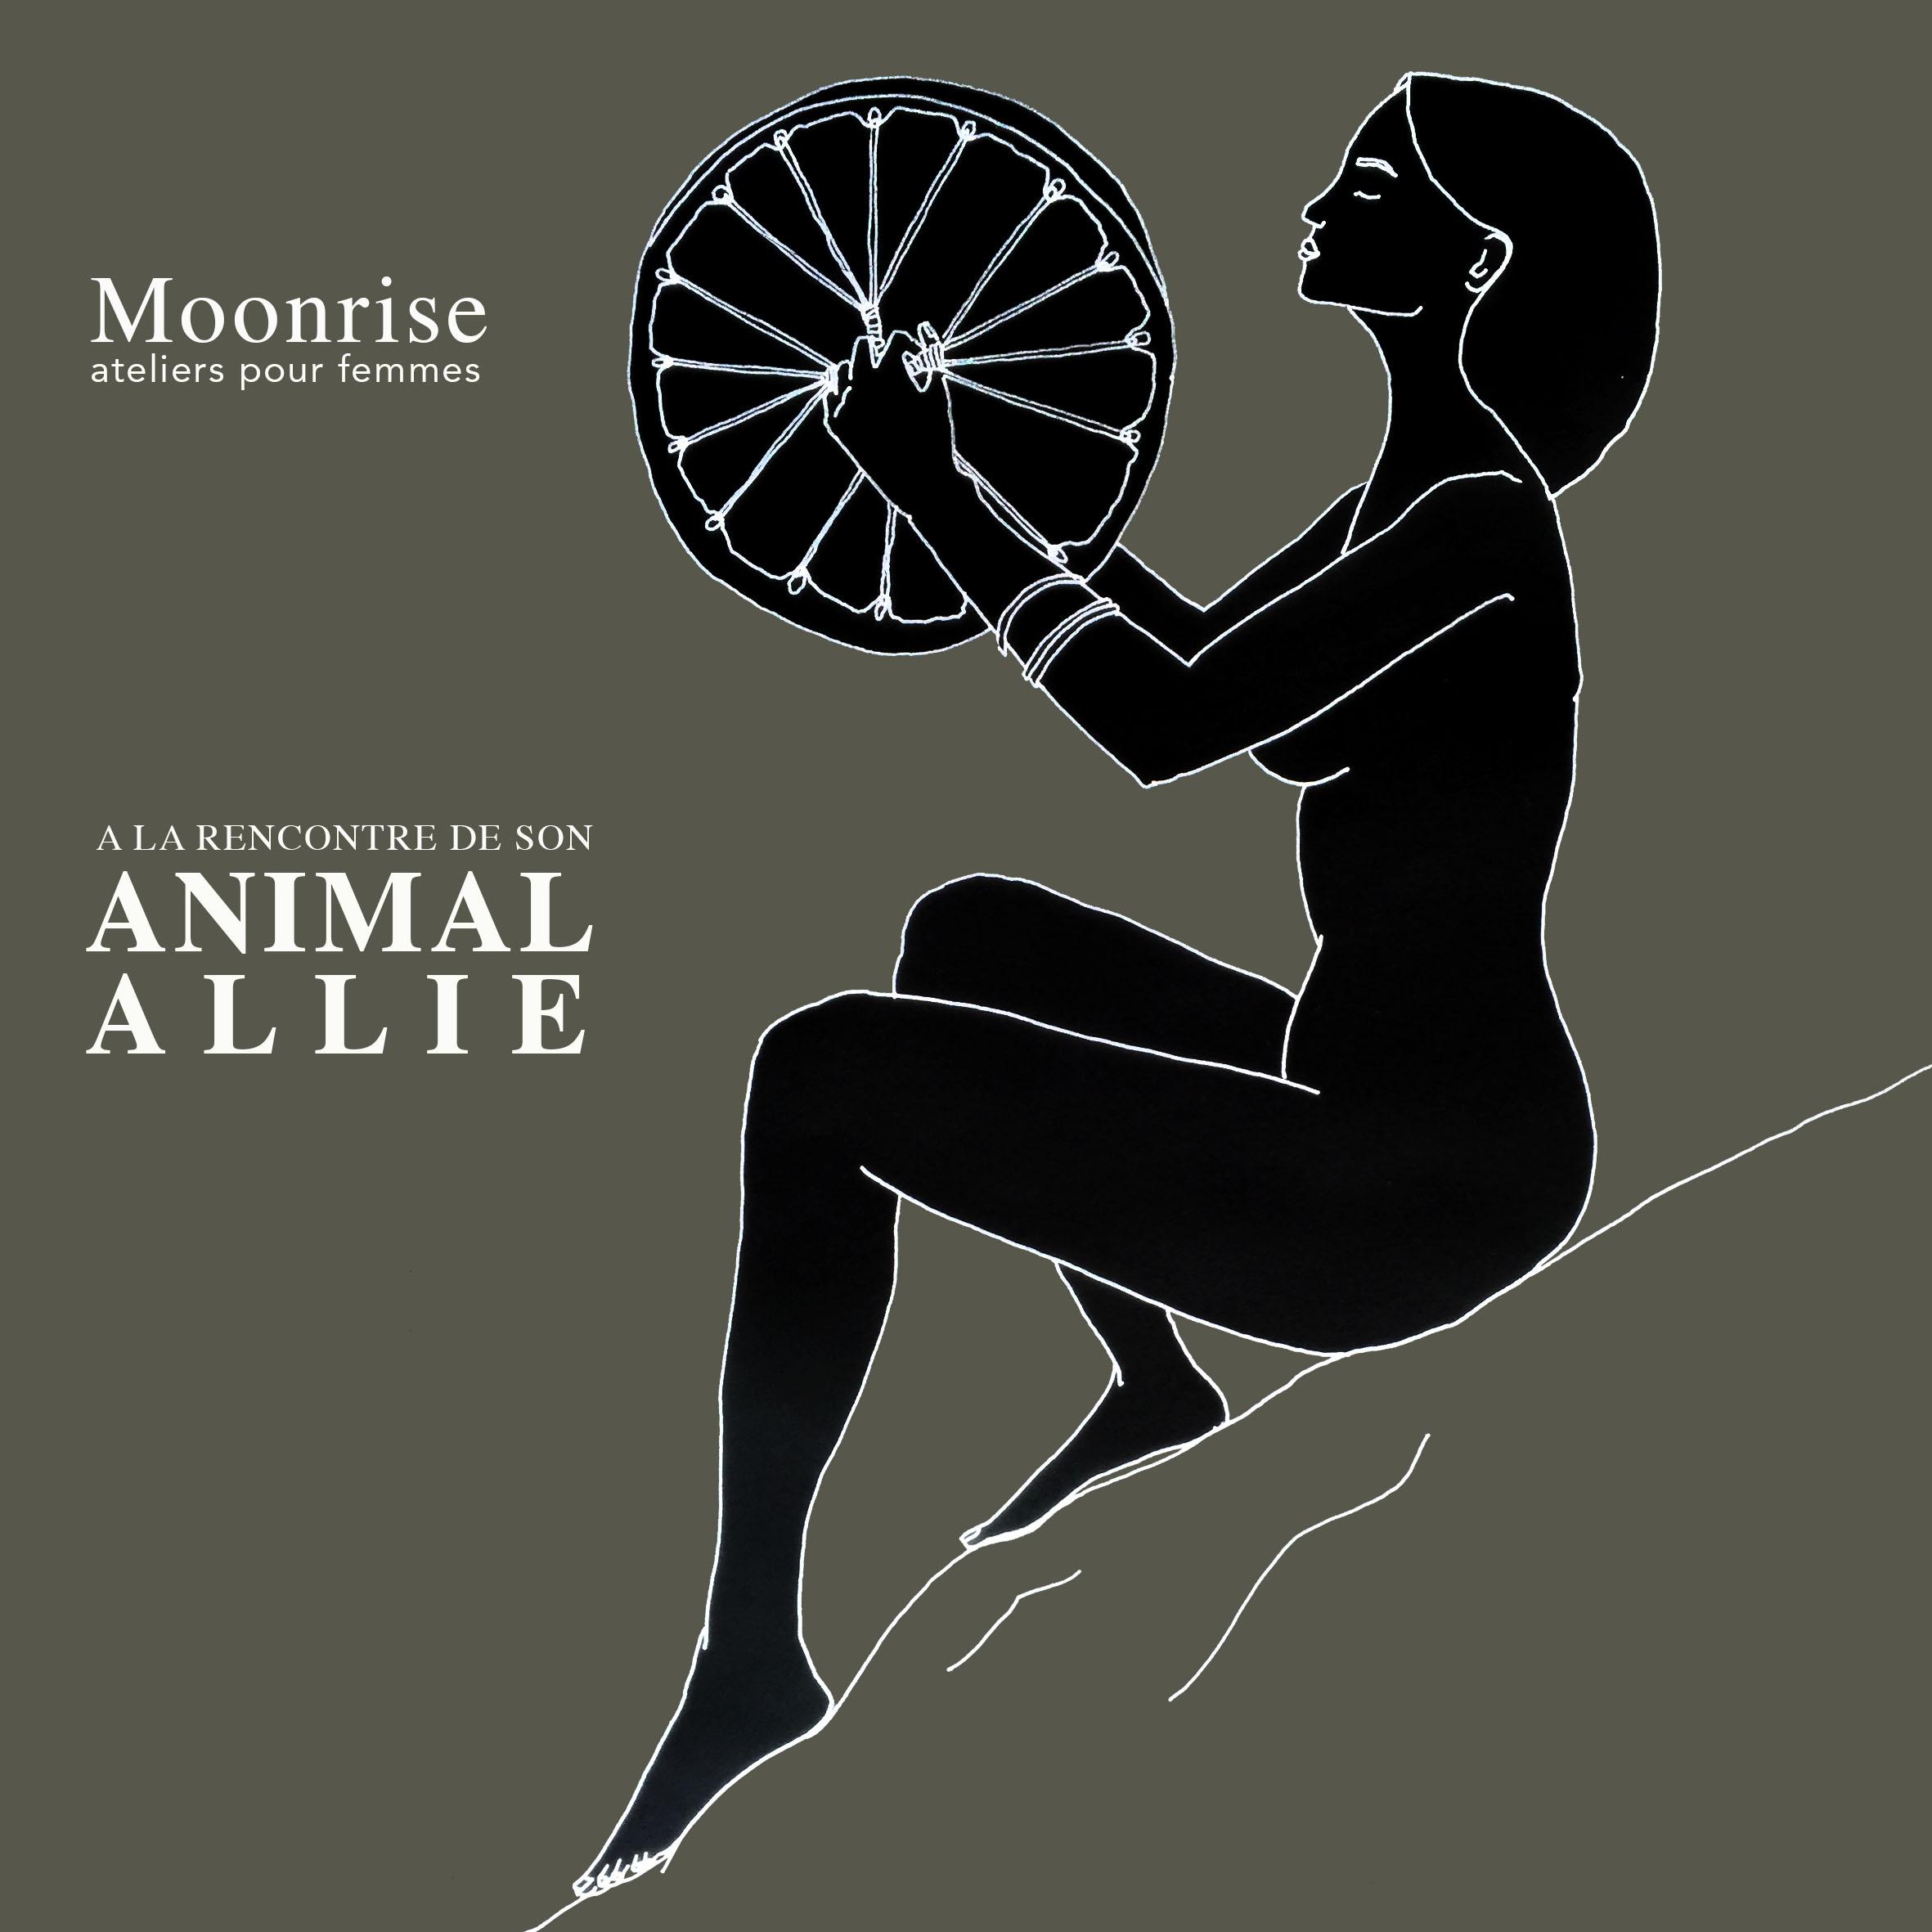 Moonrise_Atelier_Affiche_2019_AnimalAllie_02.jpg